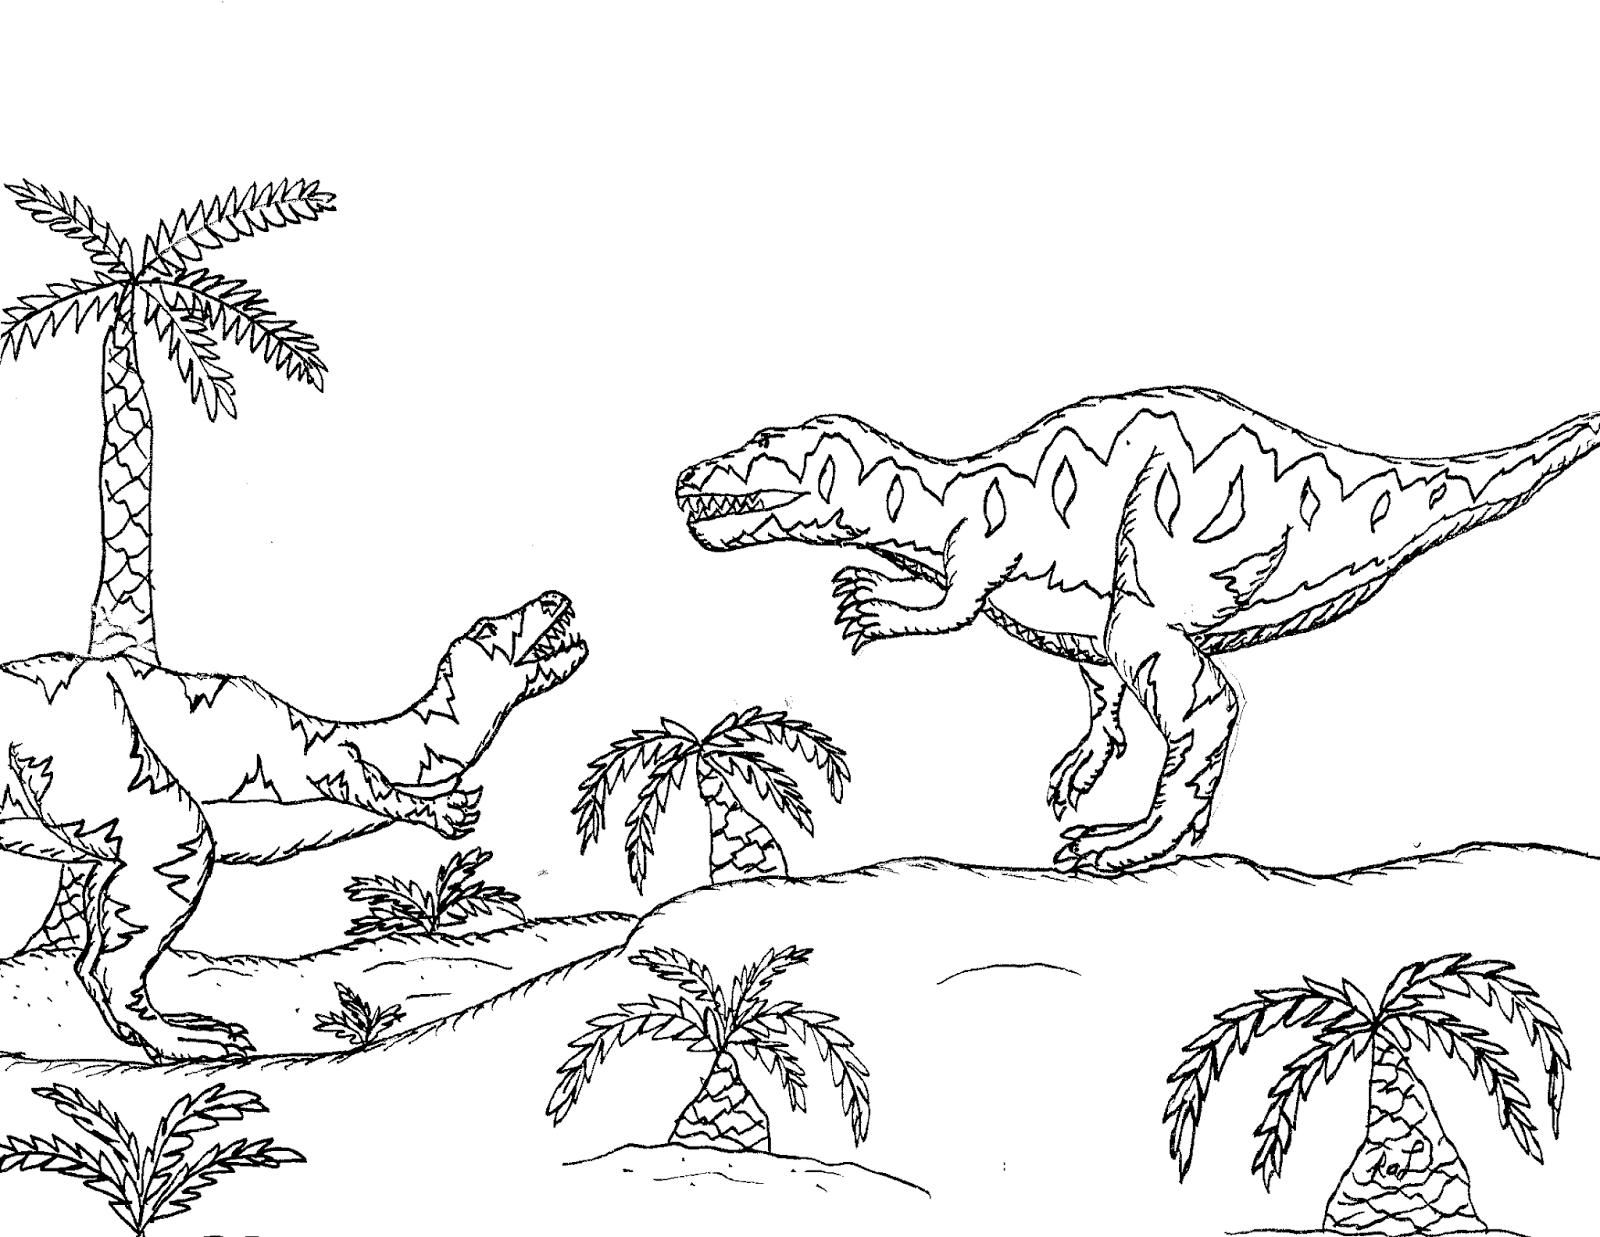 Robin\'s Great Coloring Pages: Torvosaurusvs Allosaurus & Rhamphorhyncus